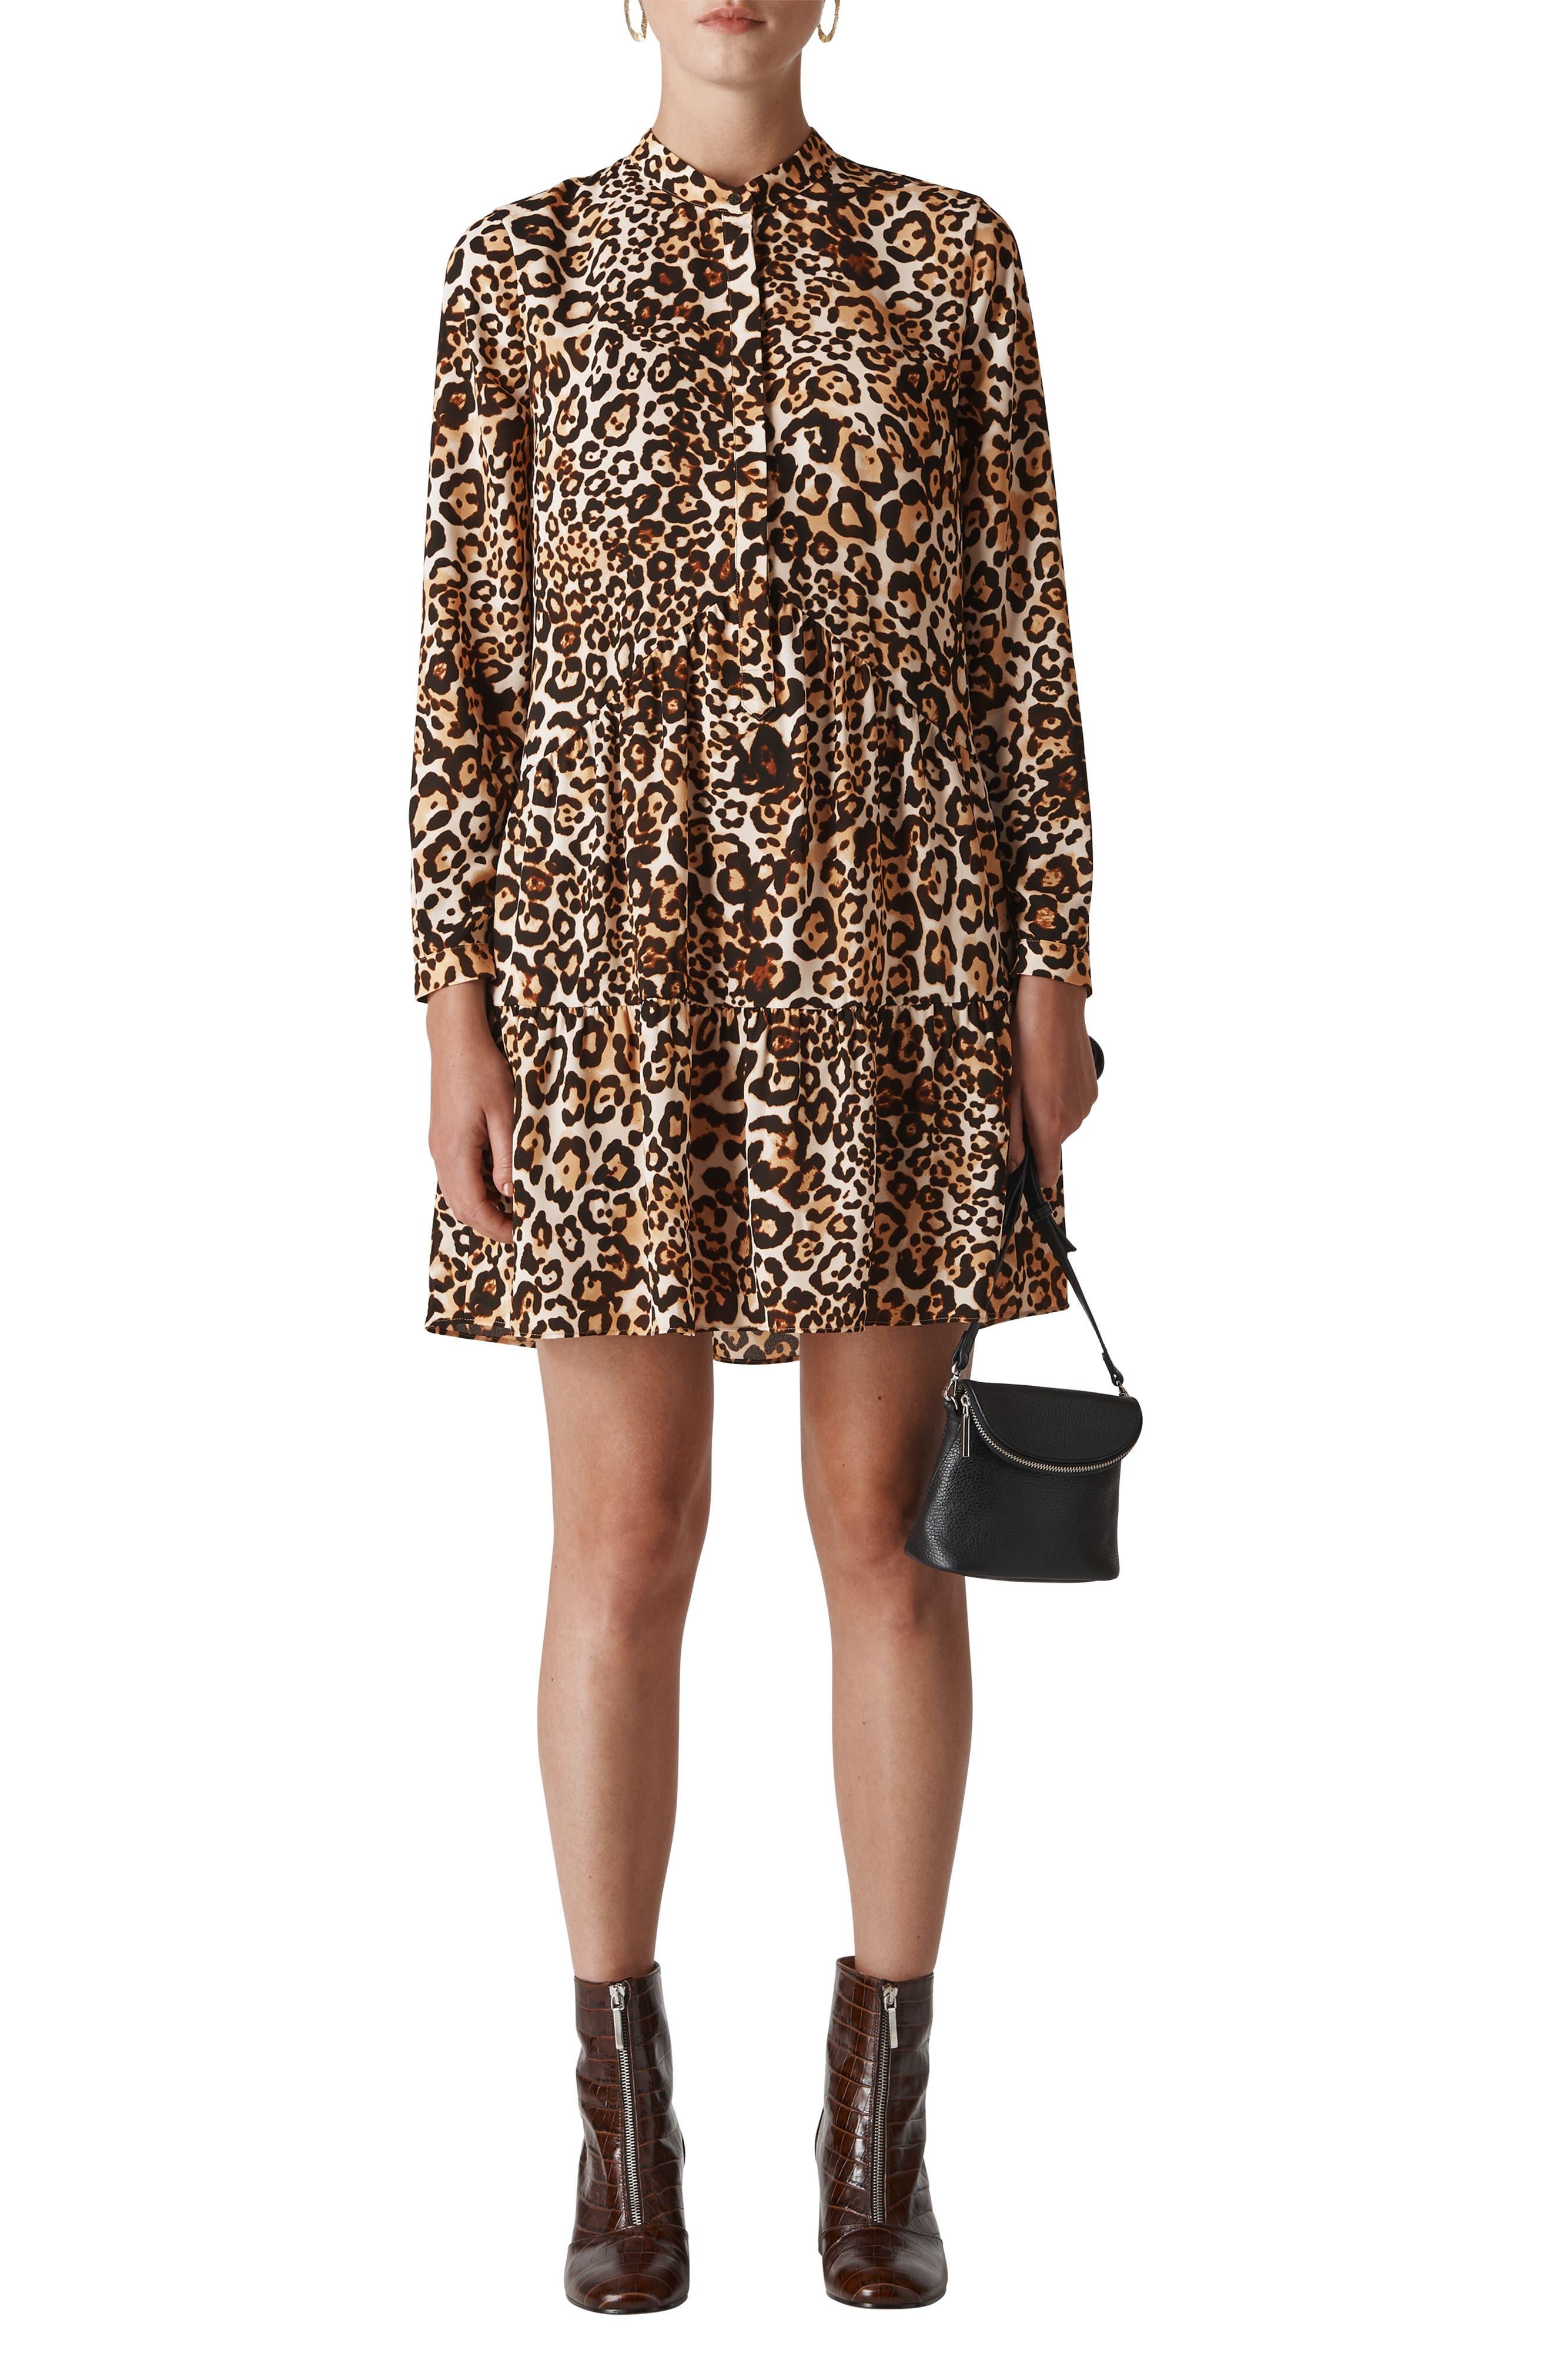 Leopard Print Shirtdress,                             Main thumbnail 1, color,                             LEOPARD PRINT